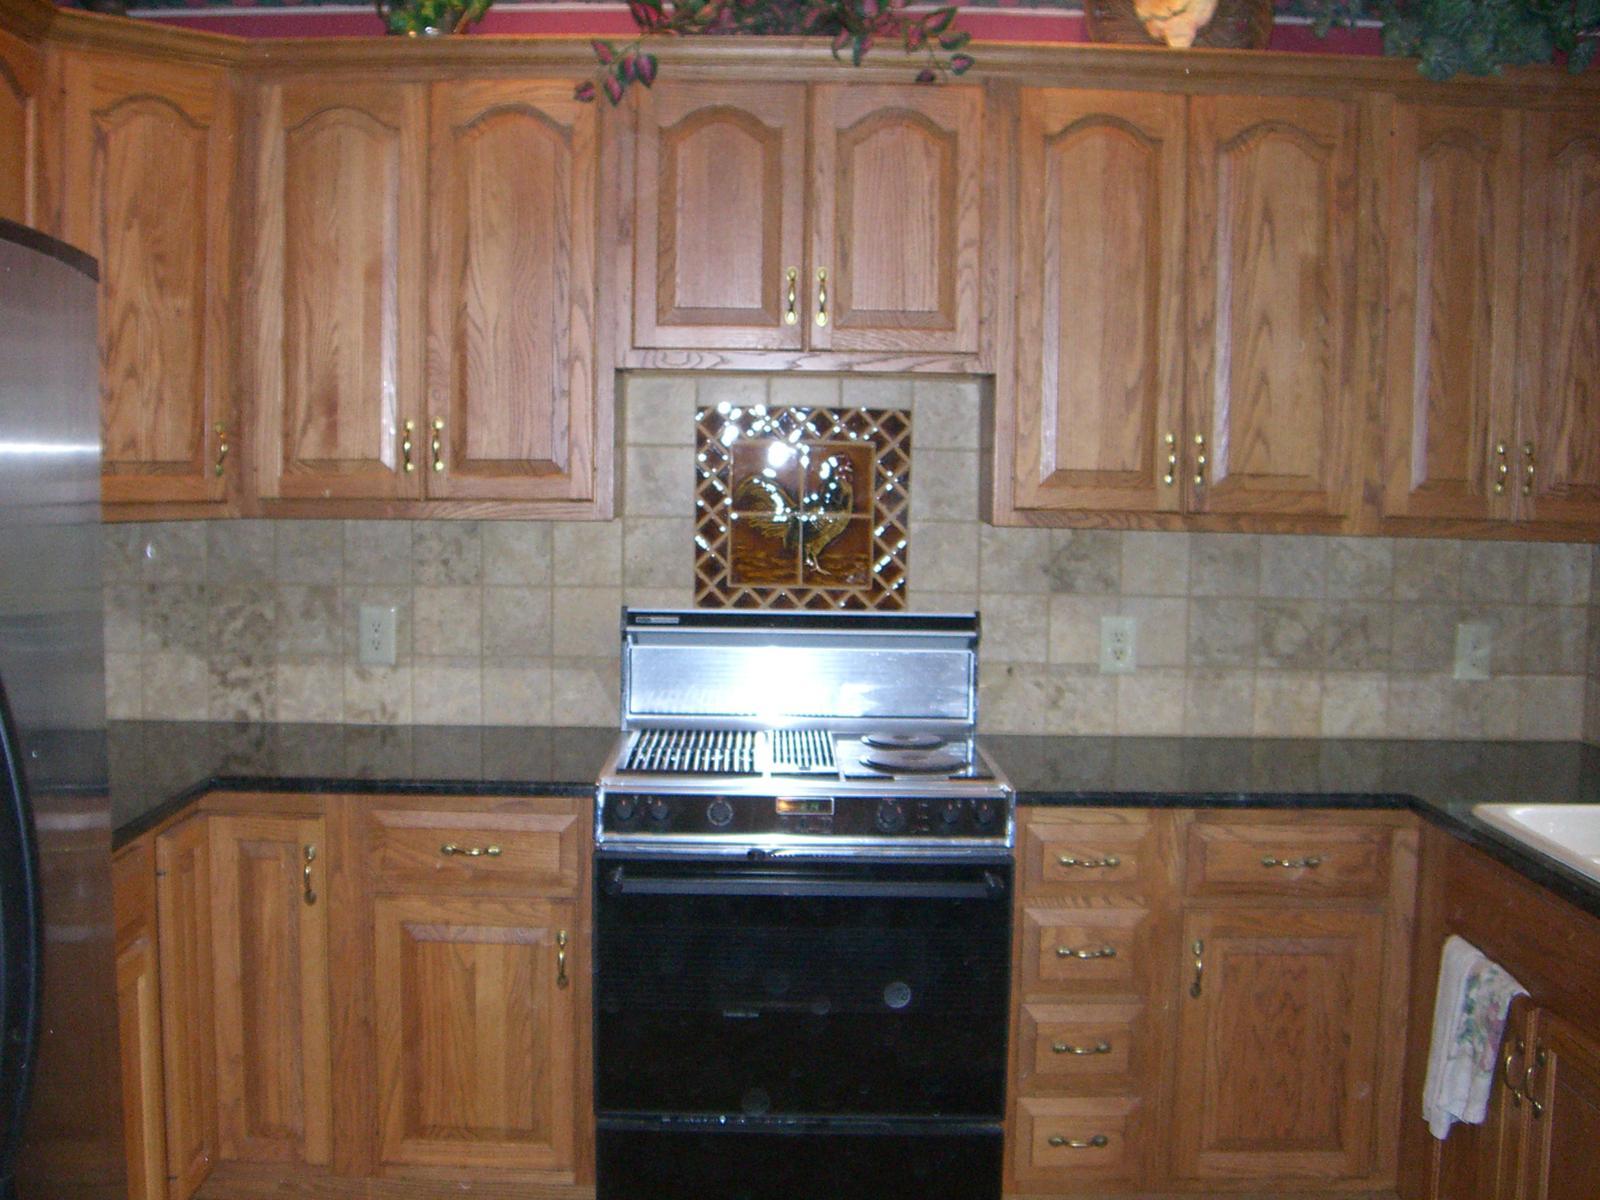 Kitchen Backsplash Pictures